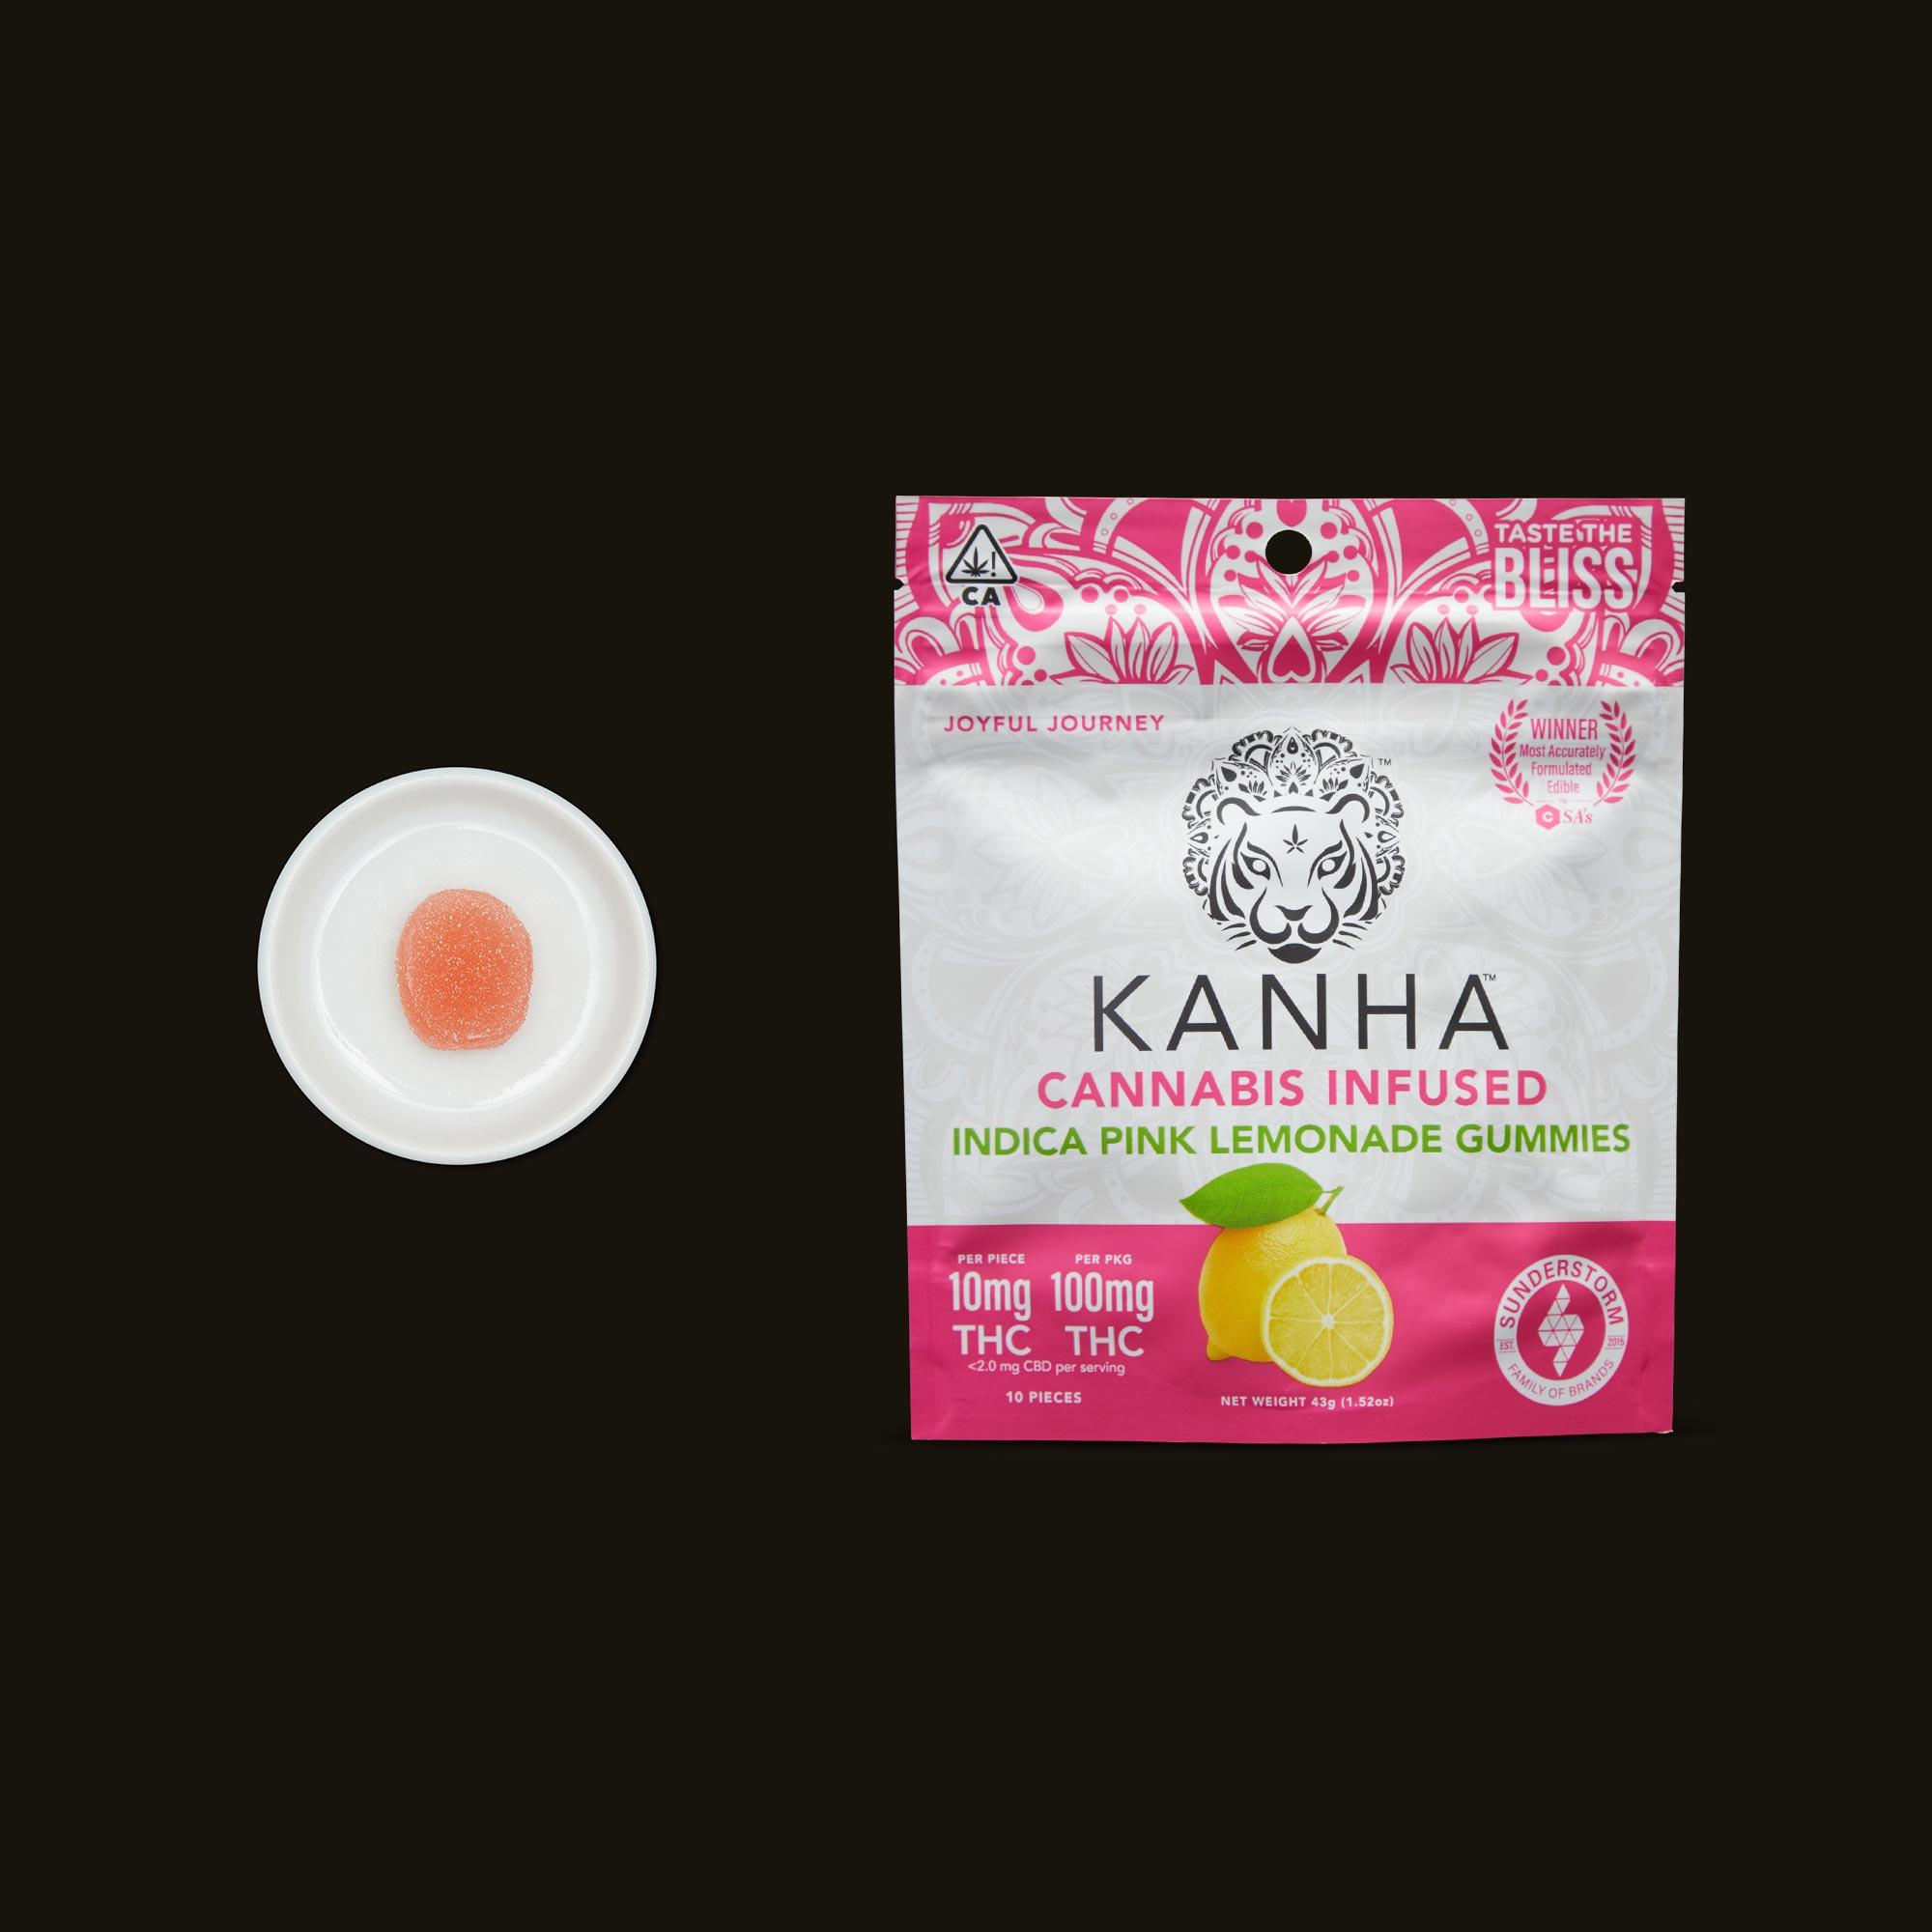 Kanha Pink Lemonade Gummies